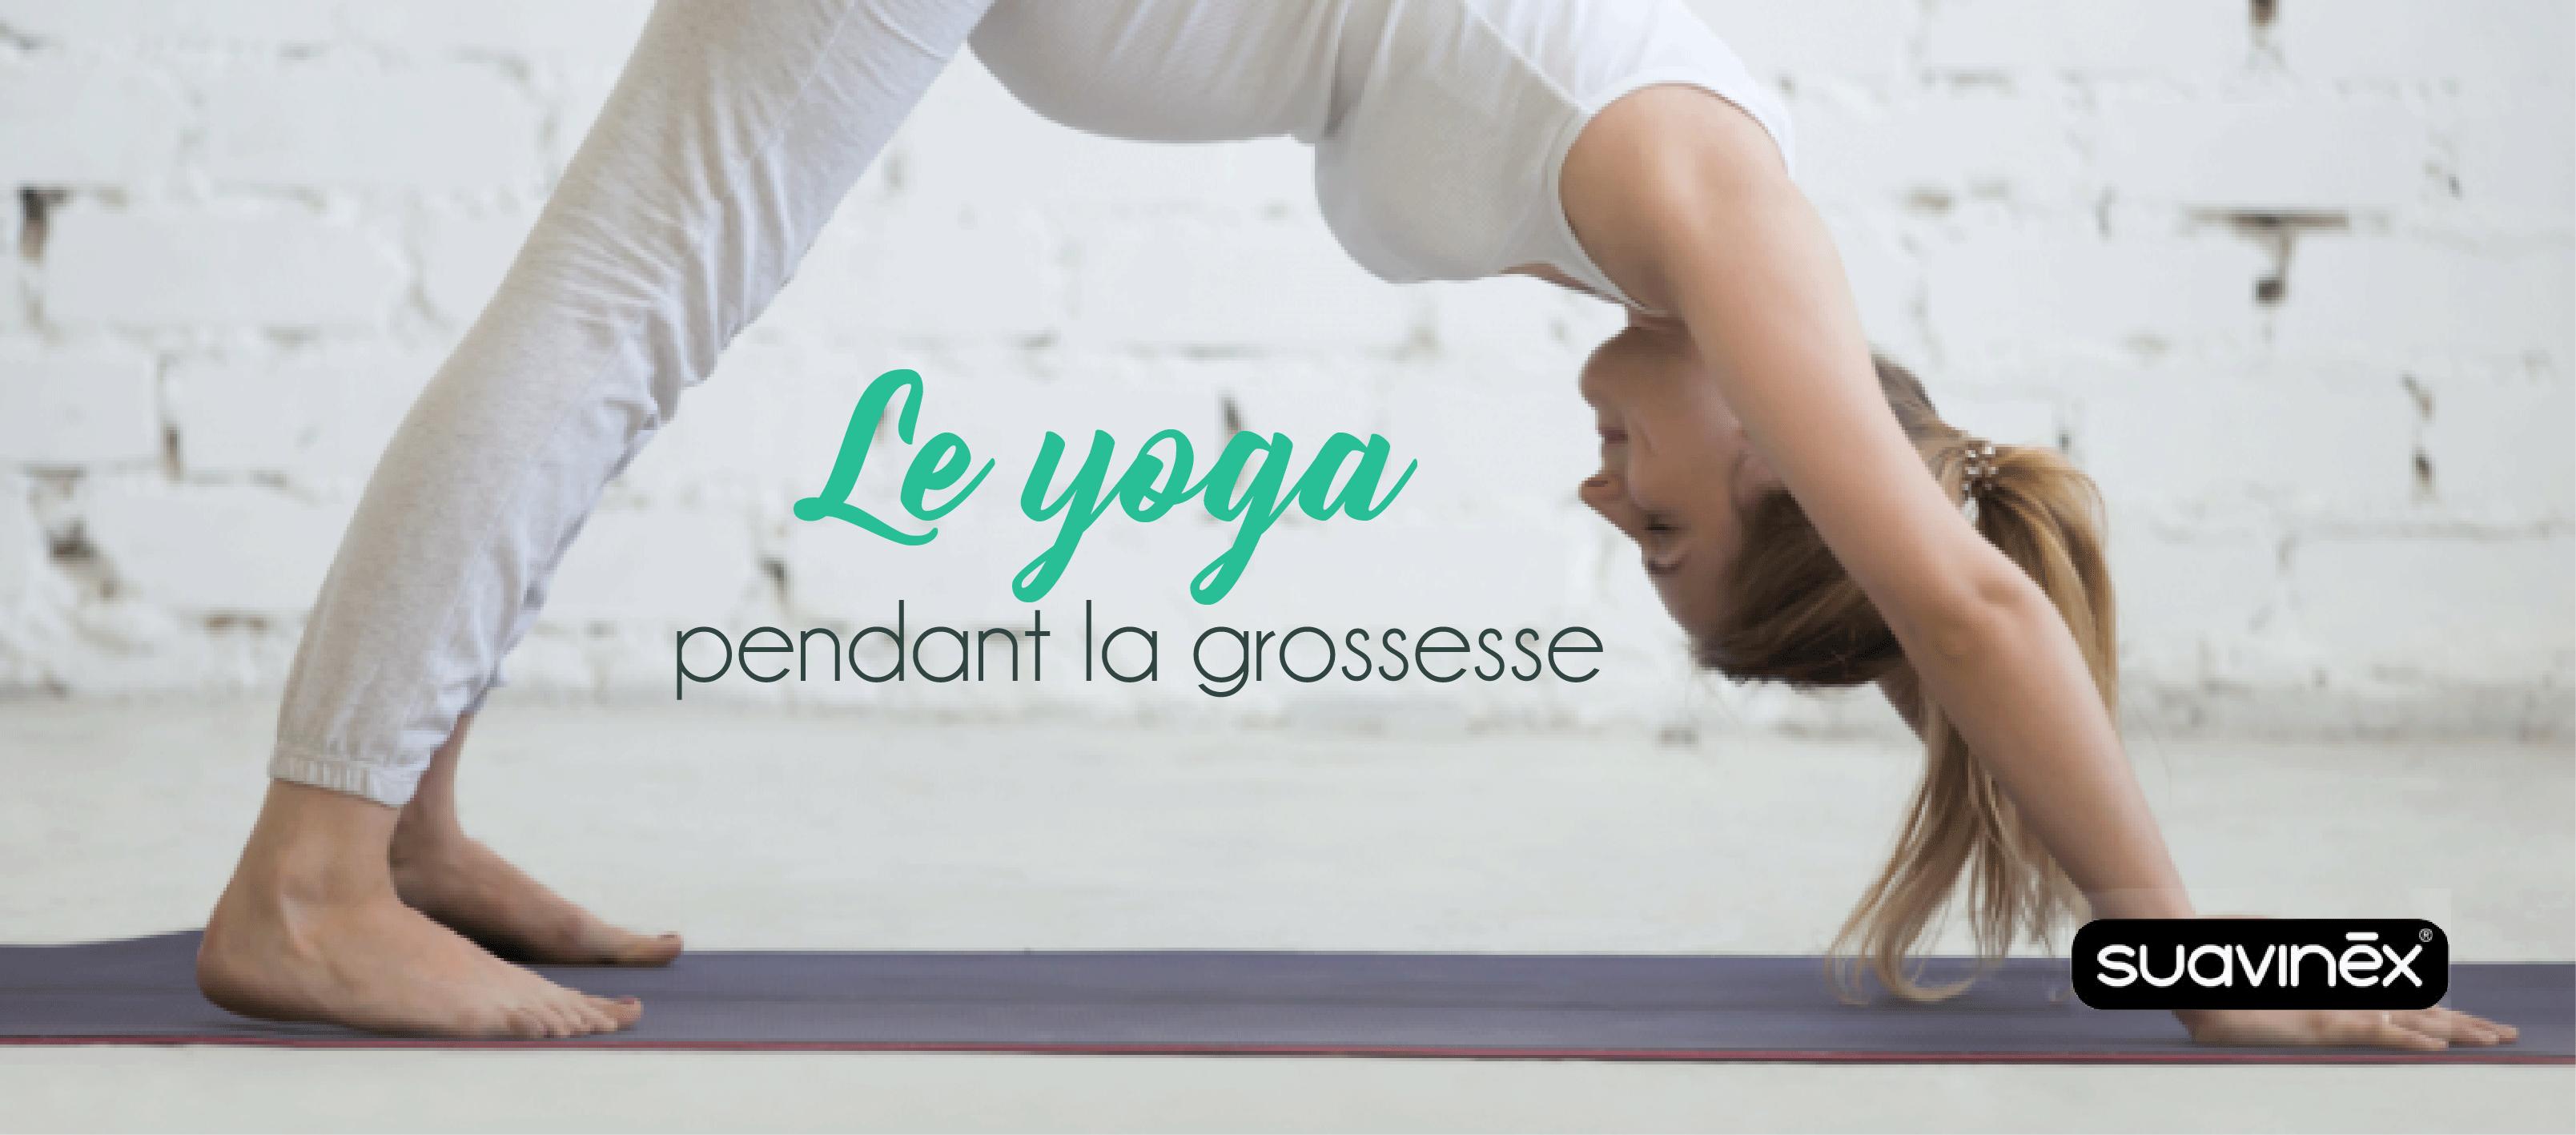 Le yoga pendant la grossesse conseils Suavinex